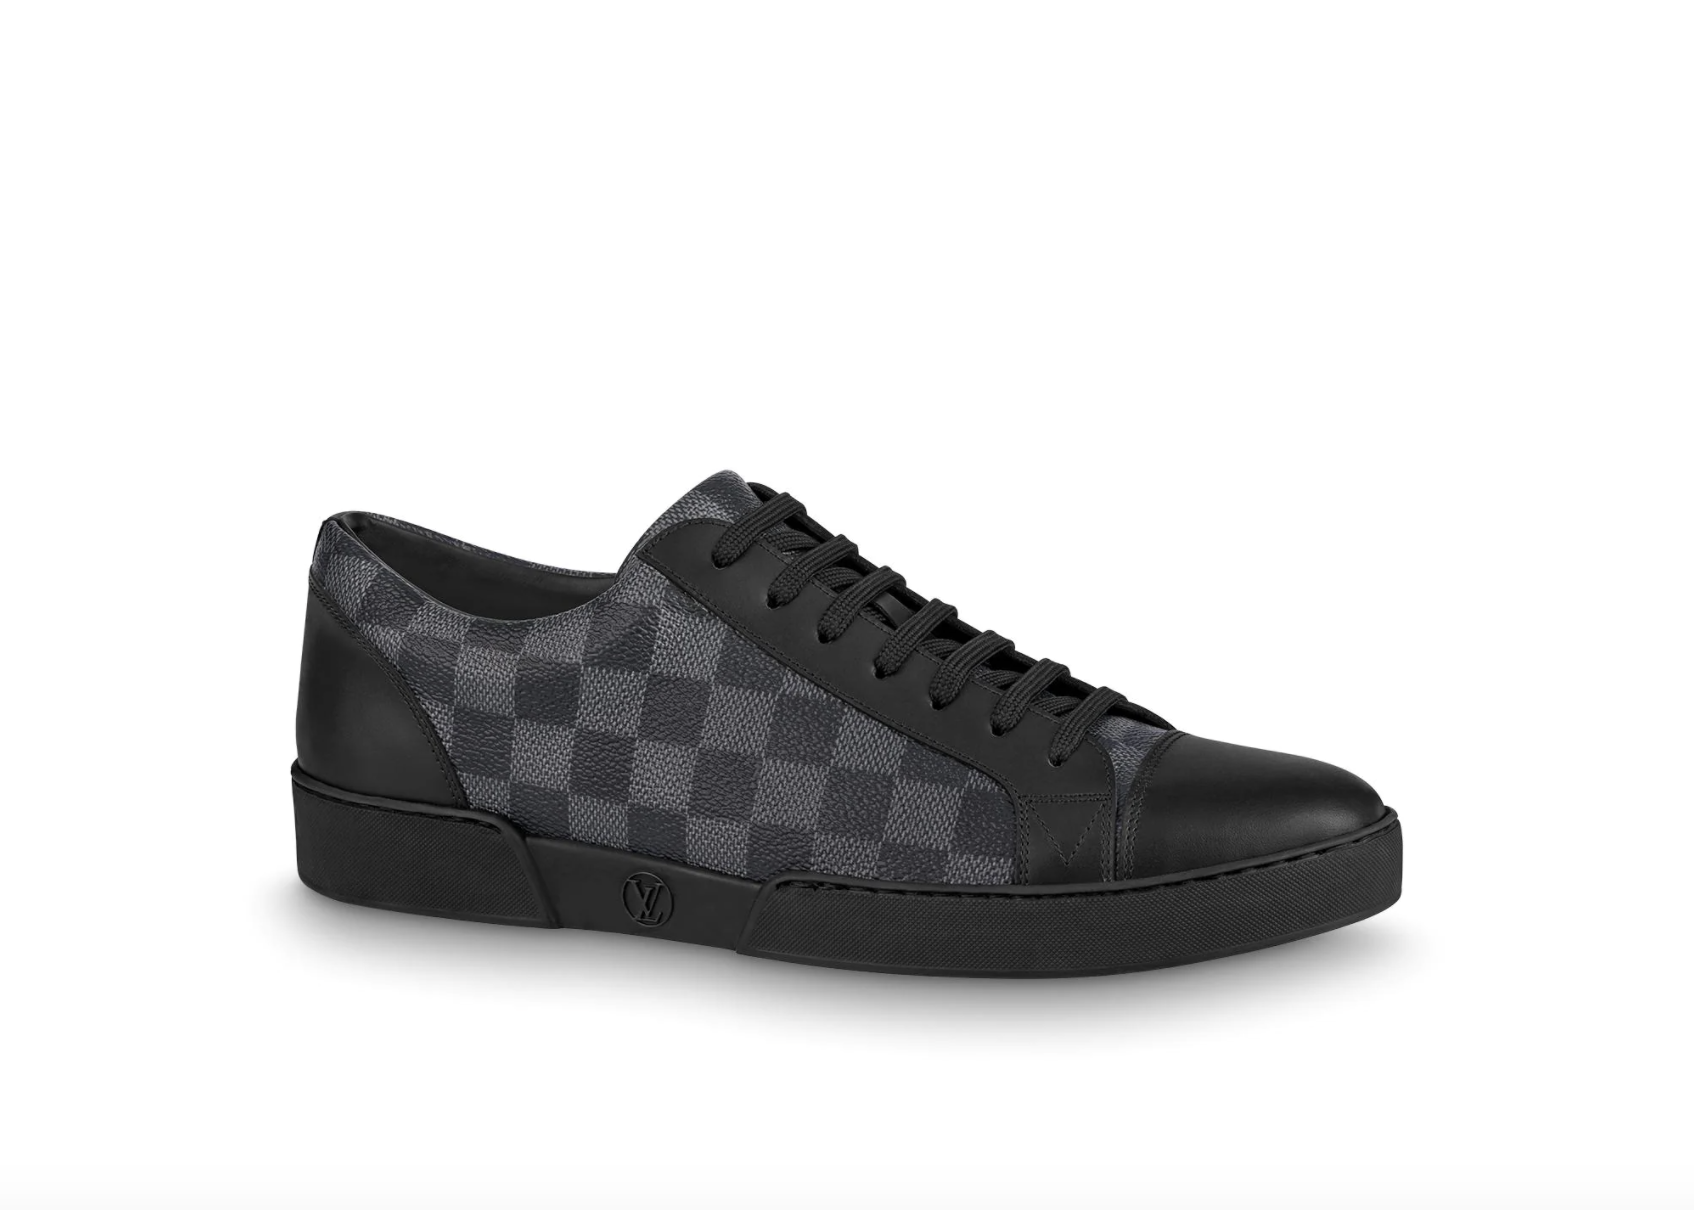 Louis Vuitton Match Up Black Damier